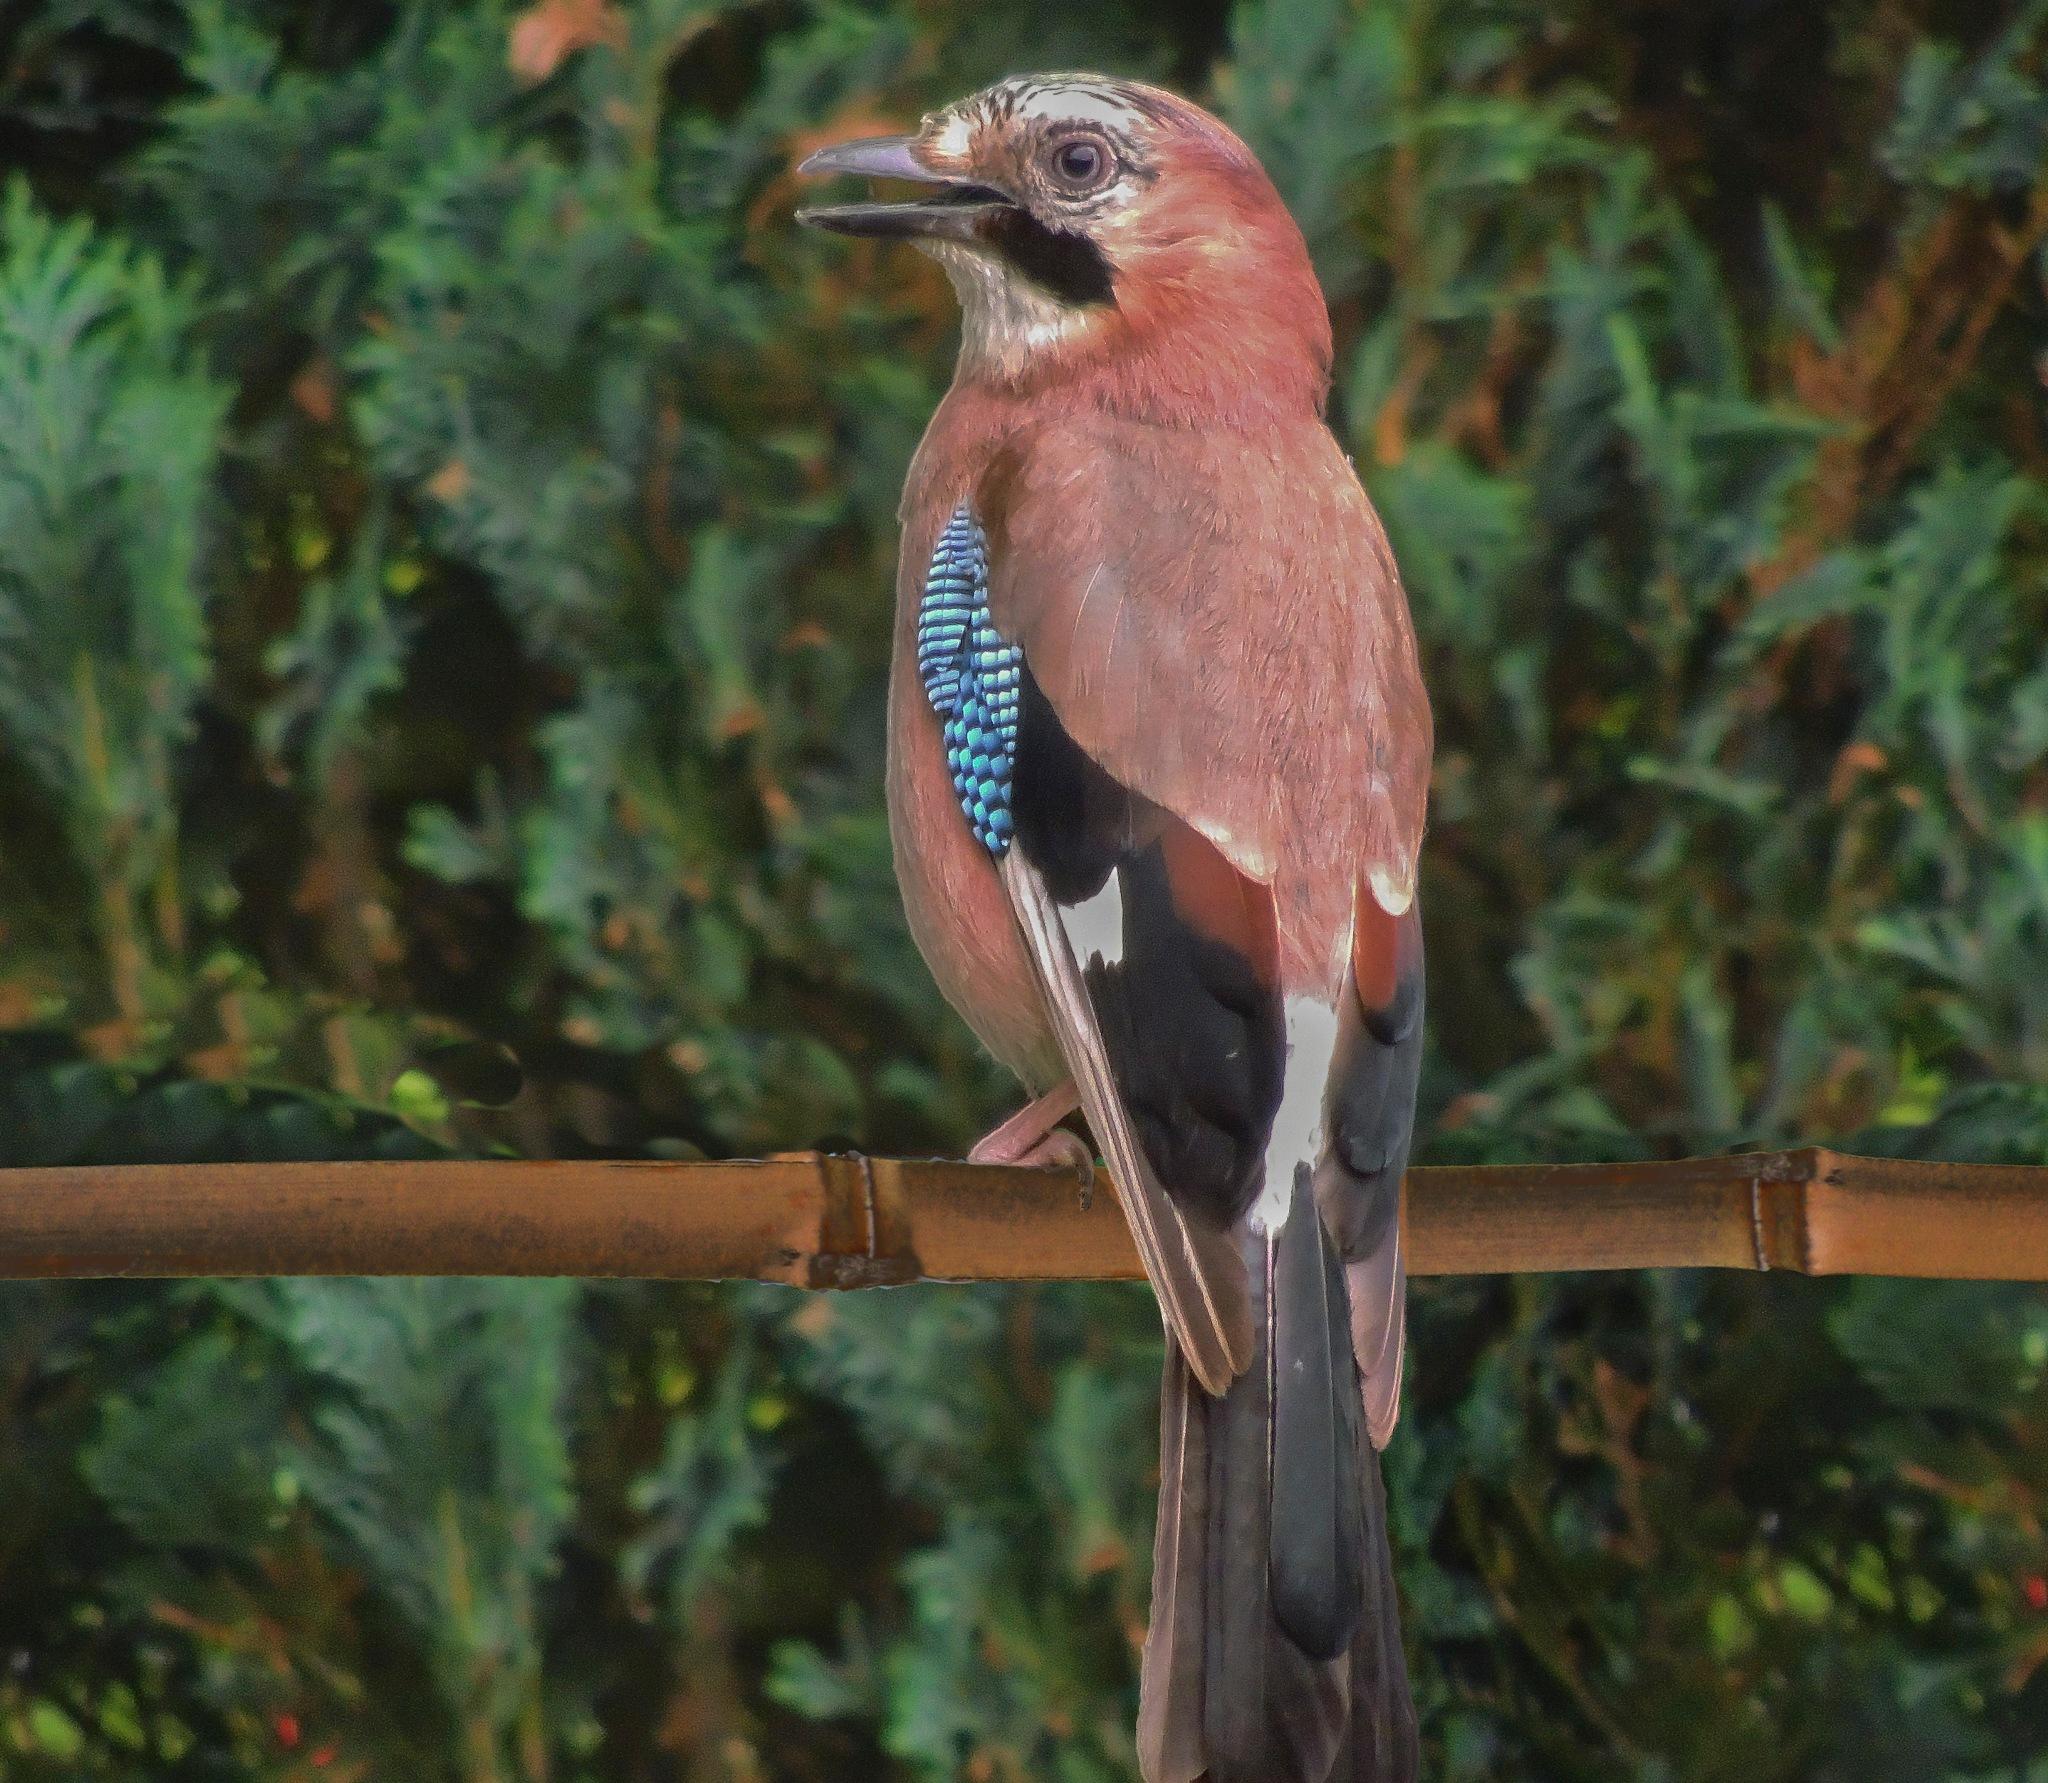 Jaybird on the watch by ghislain vancampenhoudt